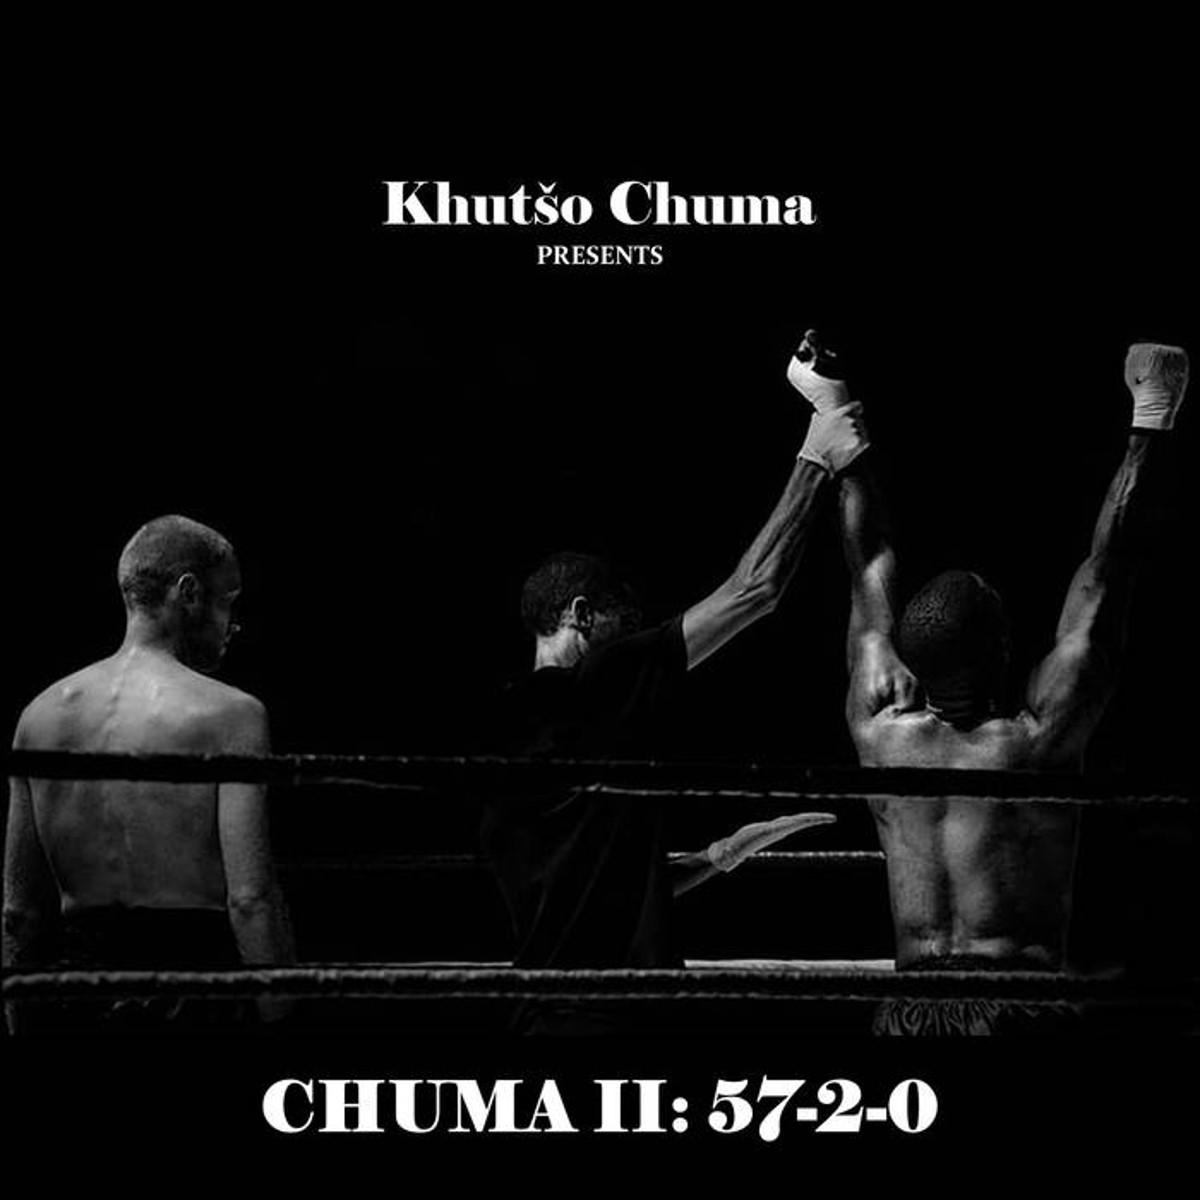 Khutšo Chuma – Chuma II: 57-2-0